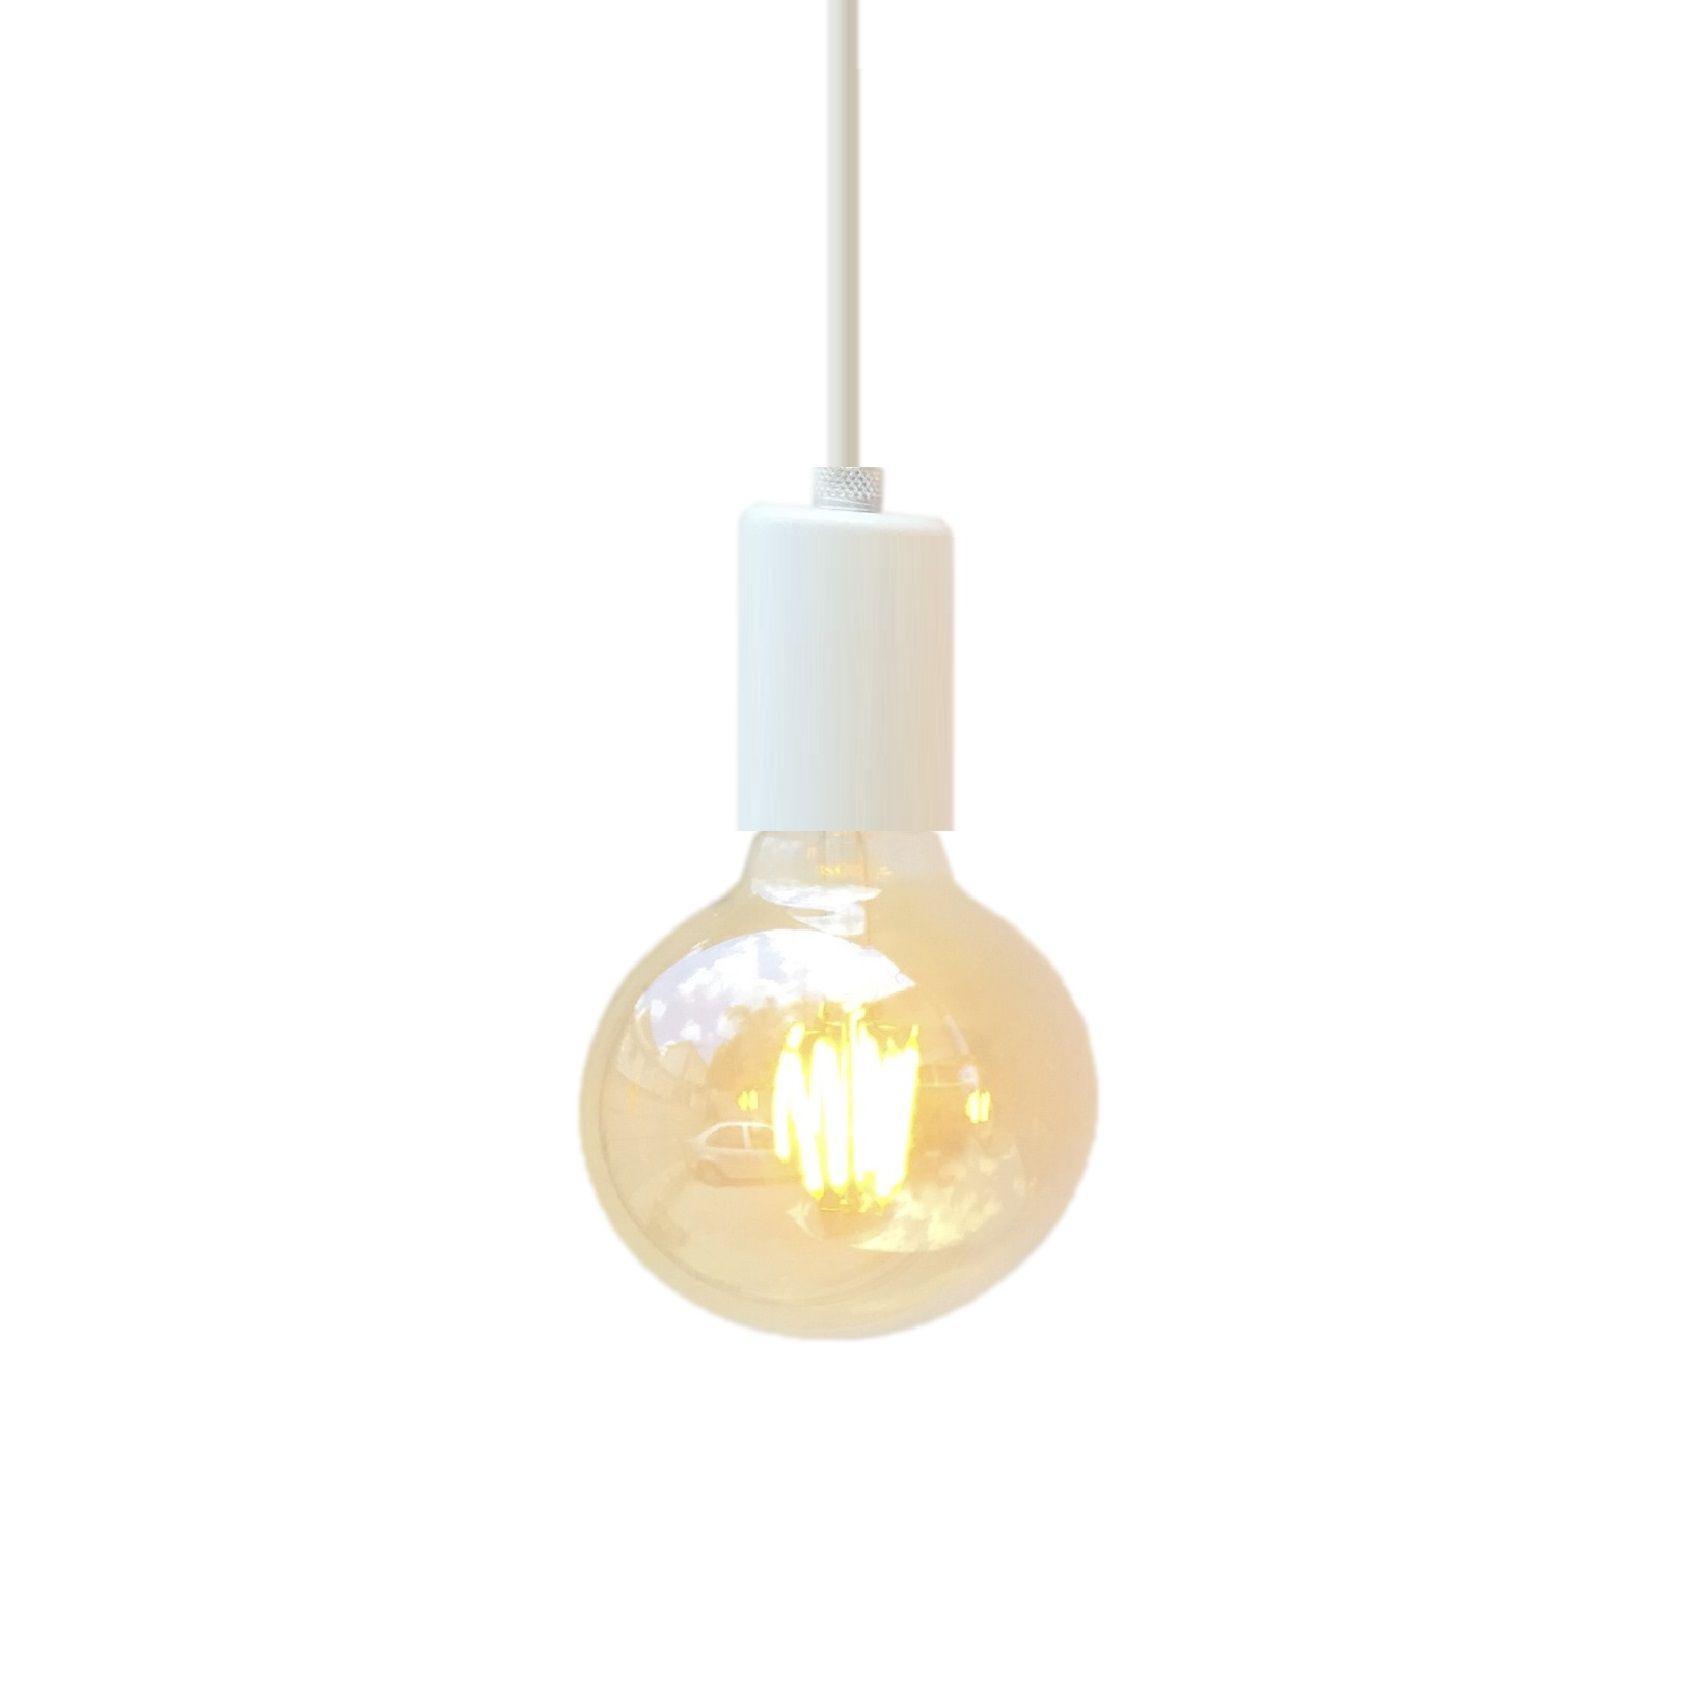 Lustre pendente metálico branco  - ZOLT luminárias